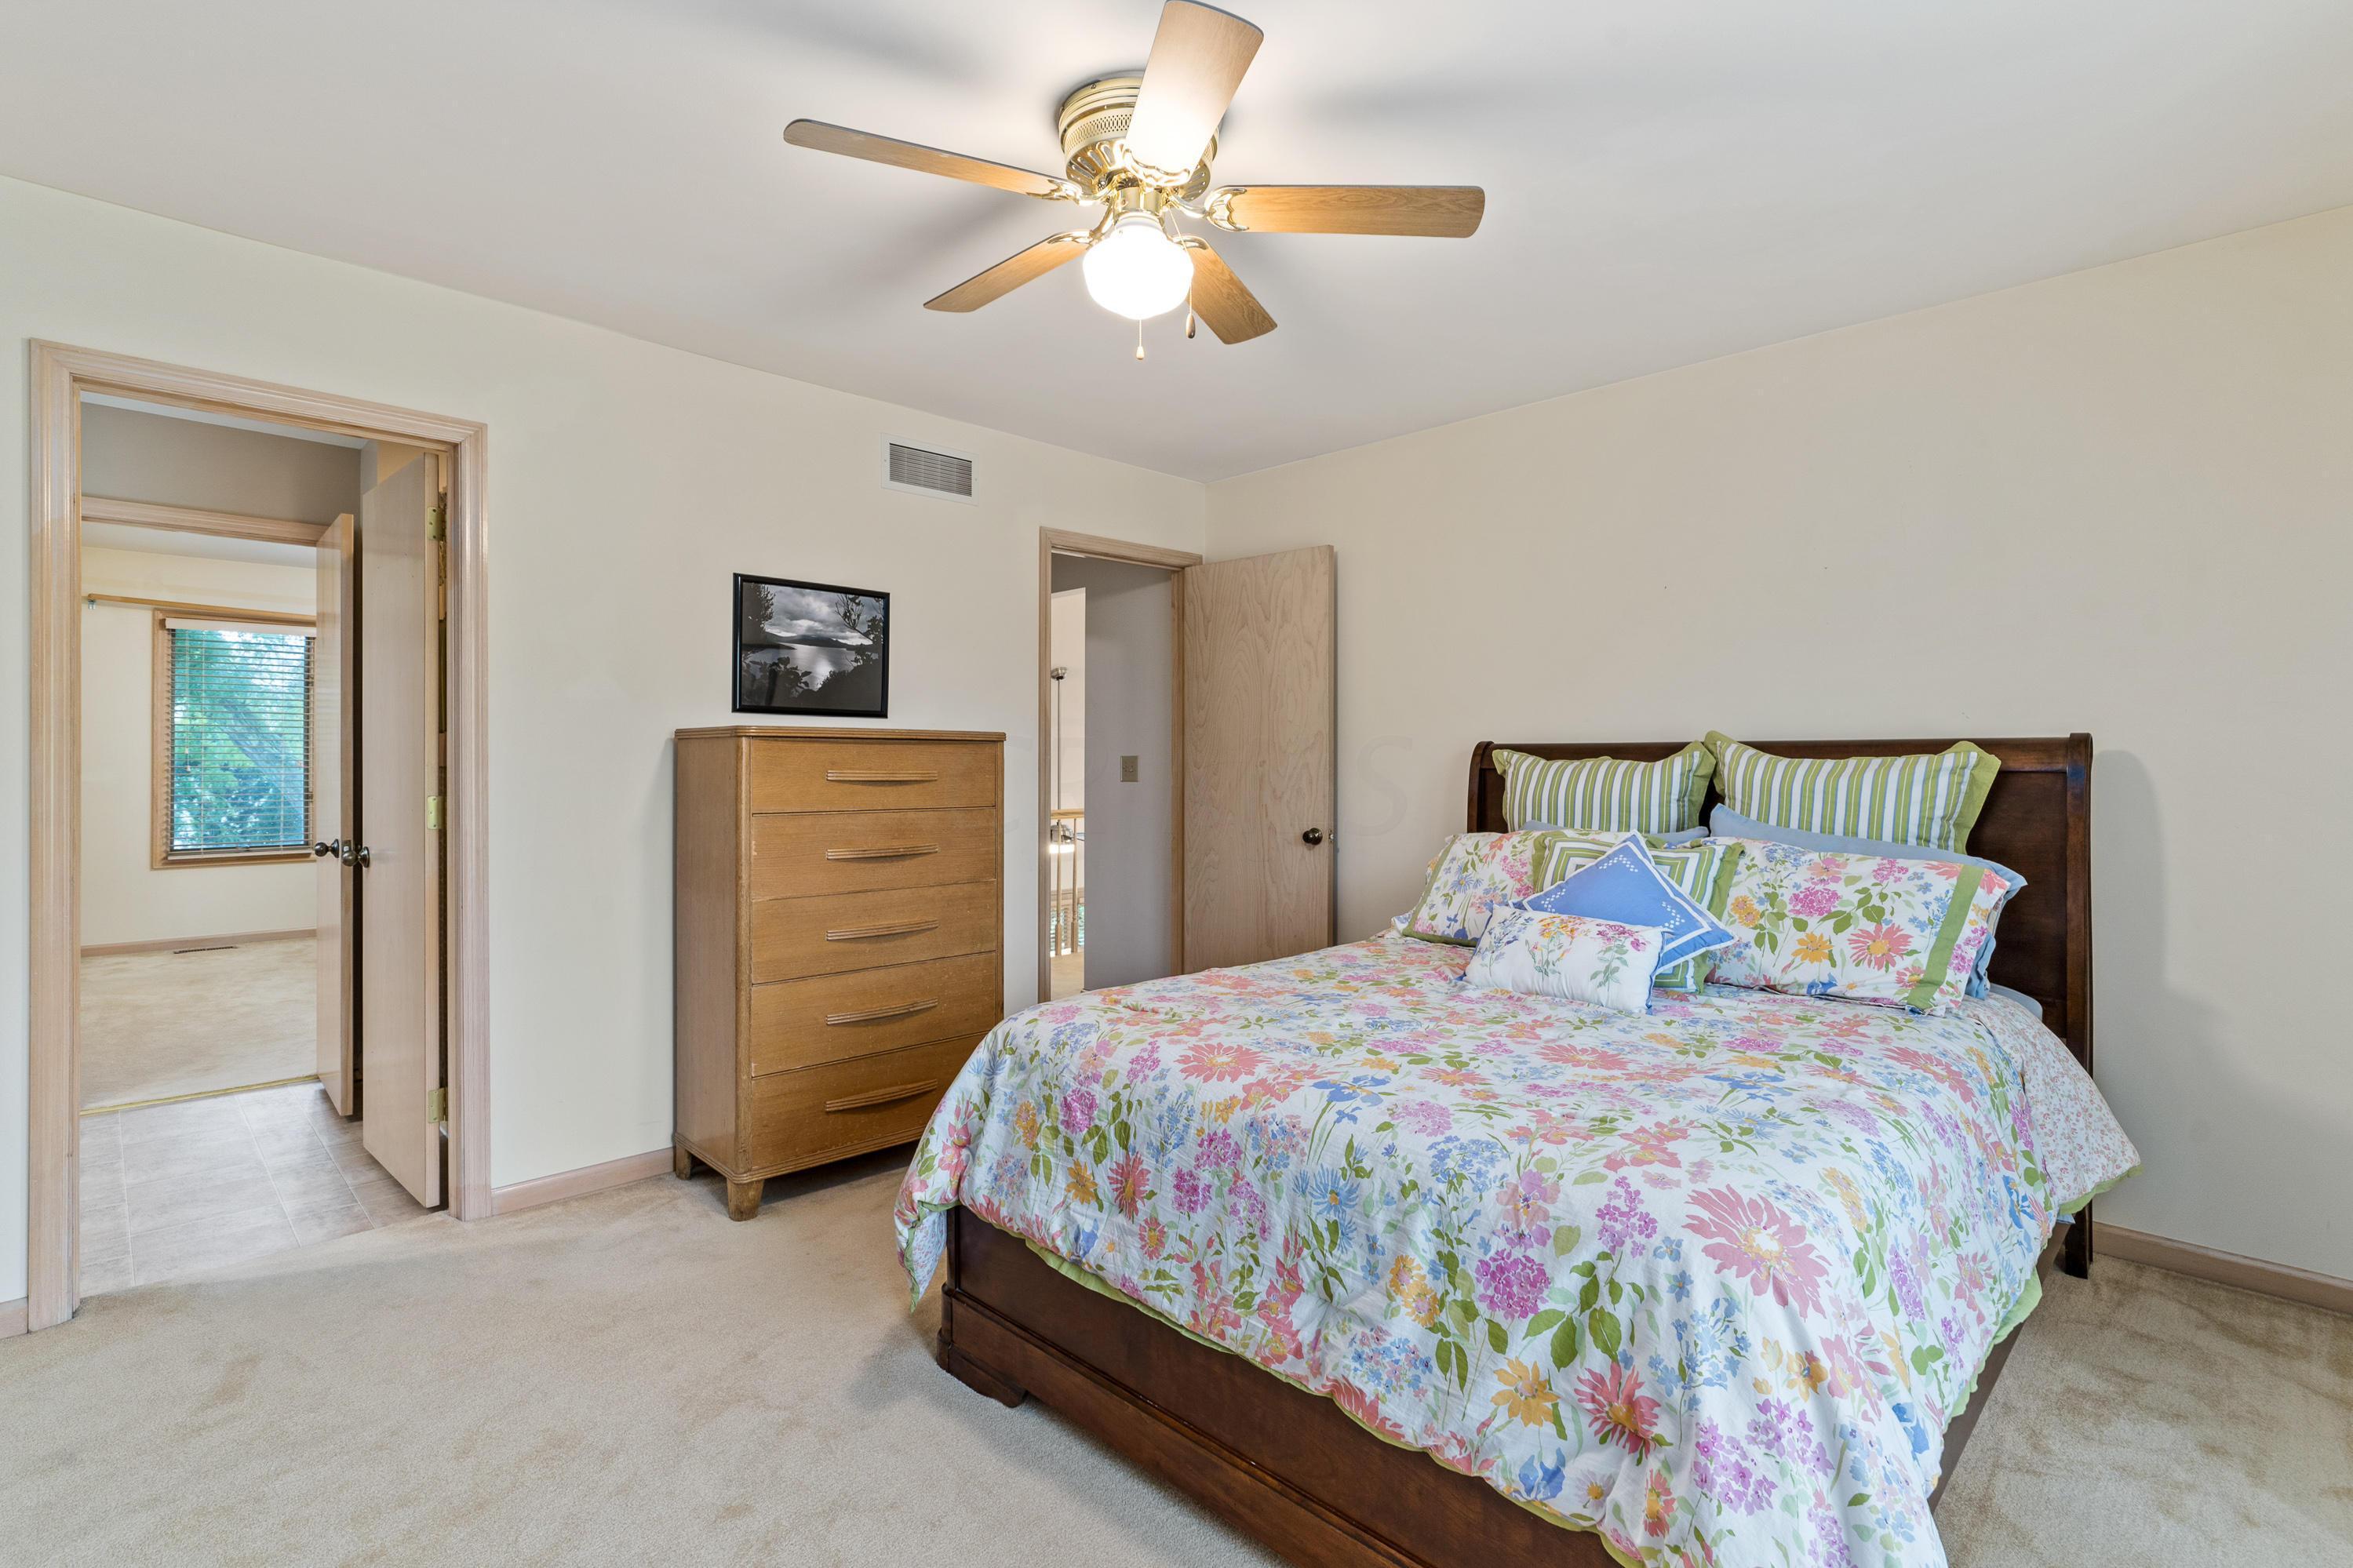 1366 Lorine Place, Columbus, Ohio 43235, 3 Bedrooms Bedrooms, ,3 BathroomsBathrooms,Residential,For Sale,Lorine,220020115